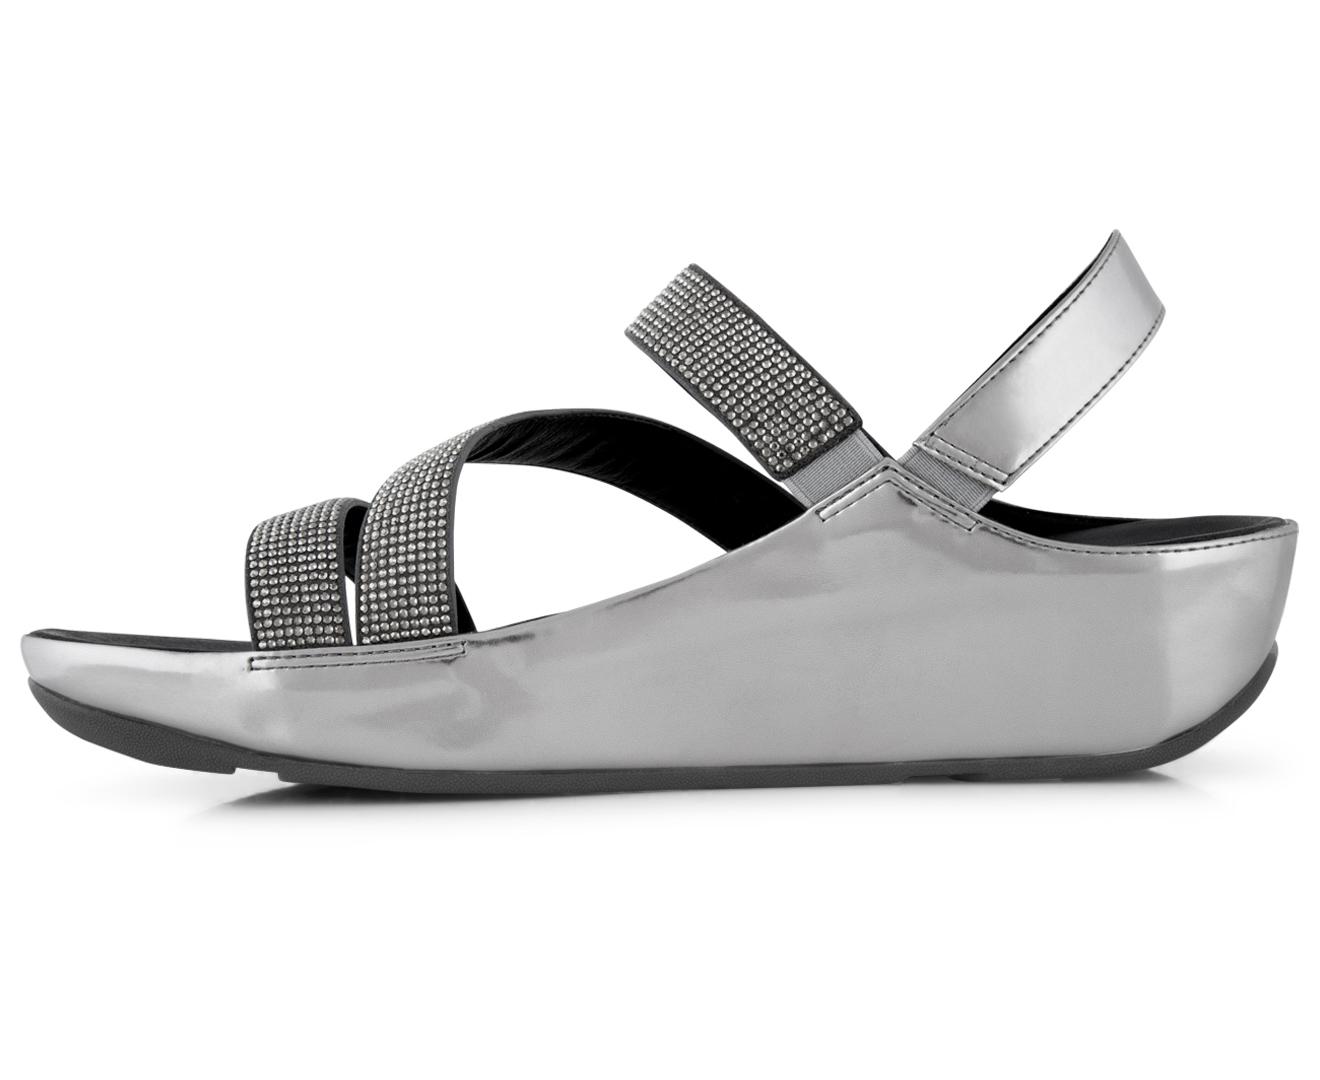 6202e424b1e9c FitFlop Women s Crystall Z-Strap Sandal - Pewter